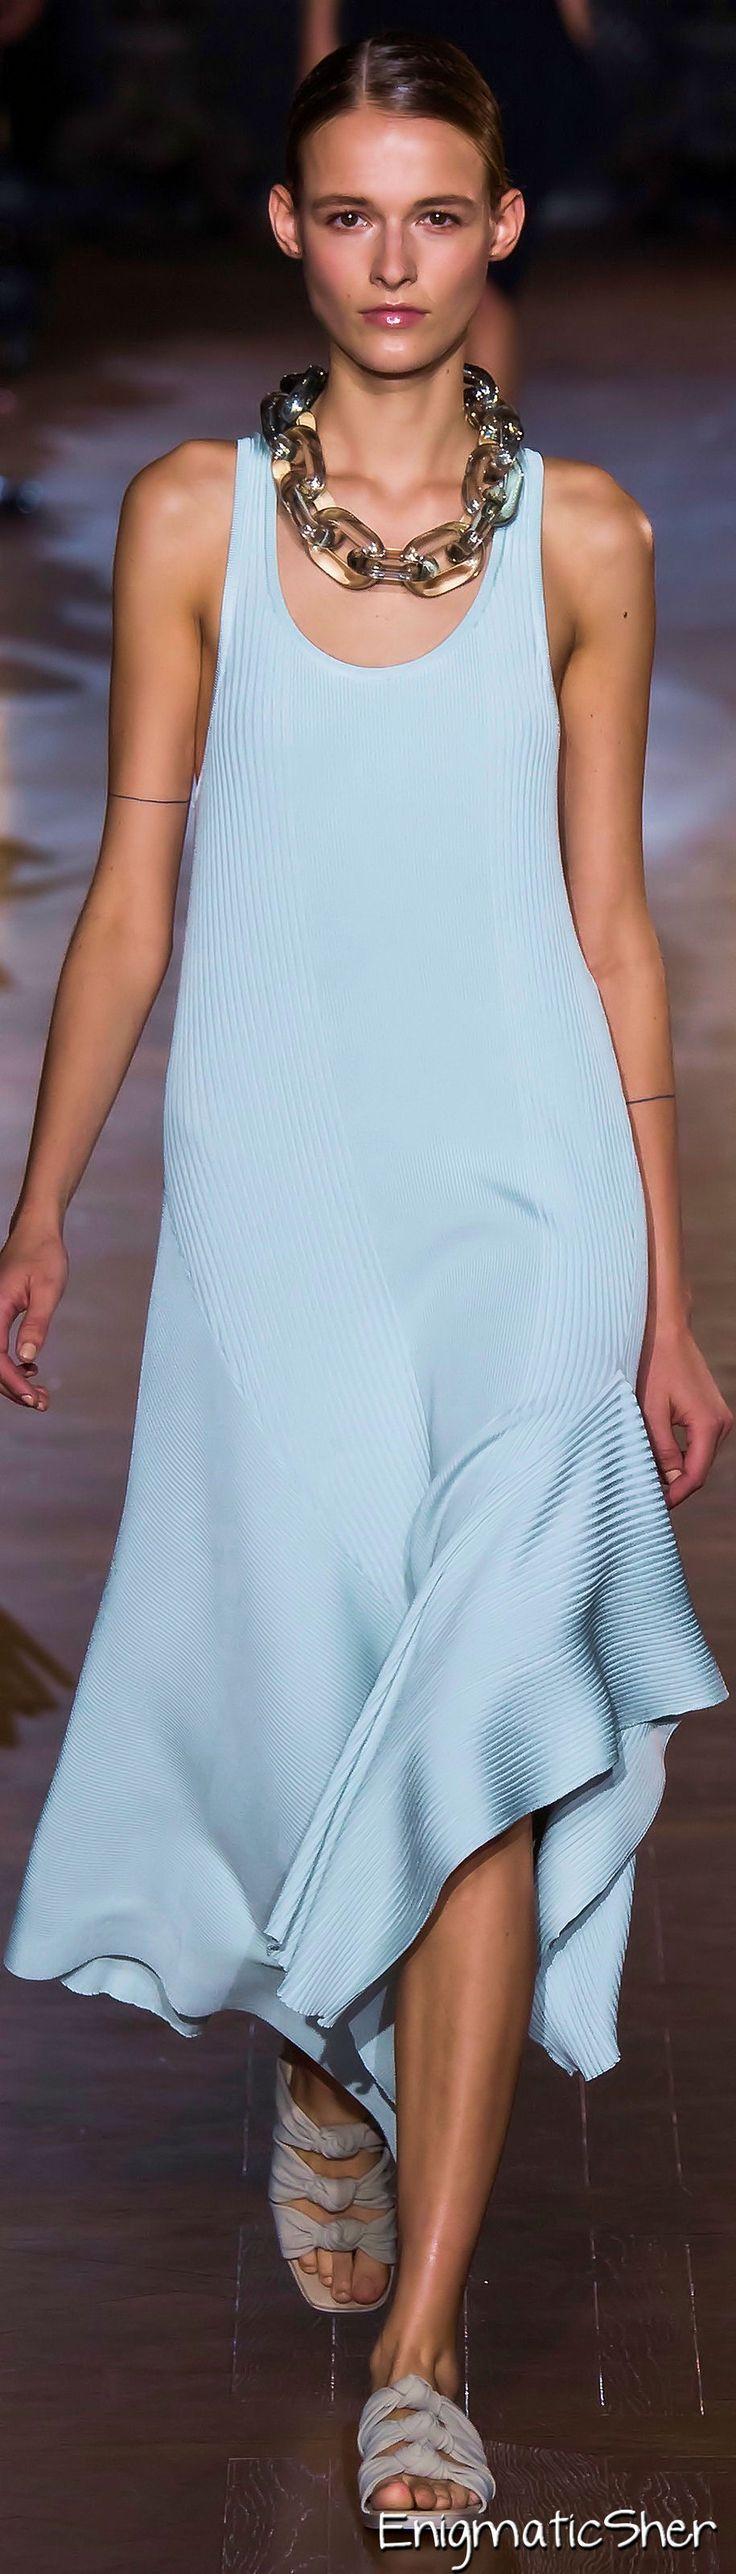 Stella McCartney Spring Summer 2015 Ready-To-Wear